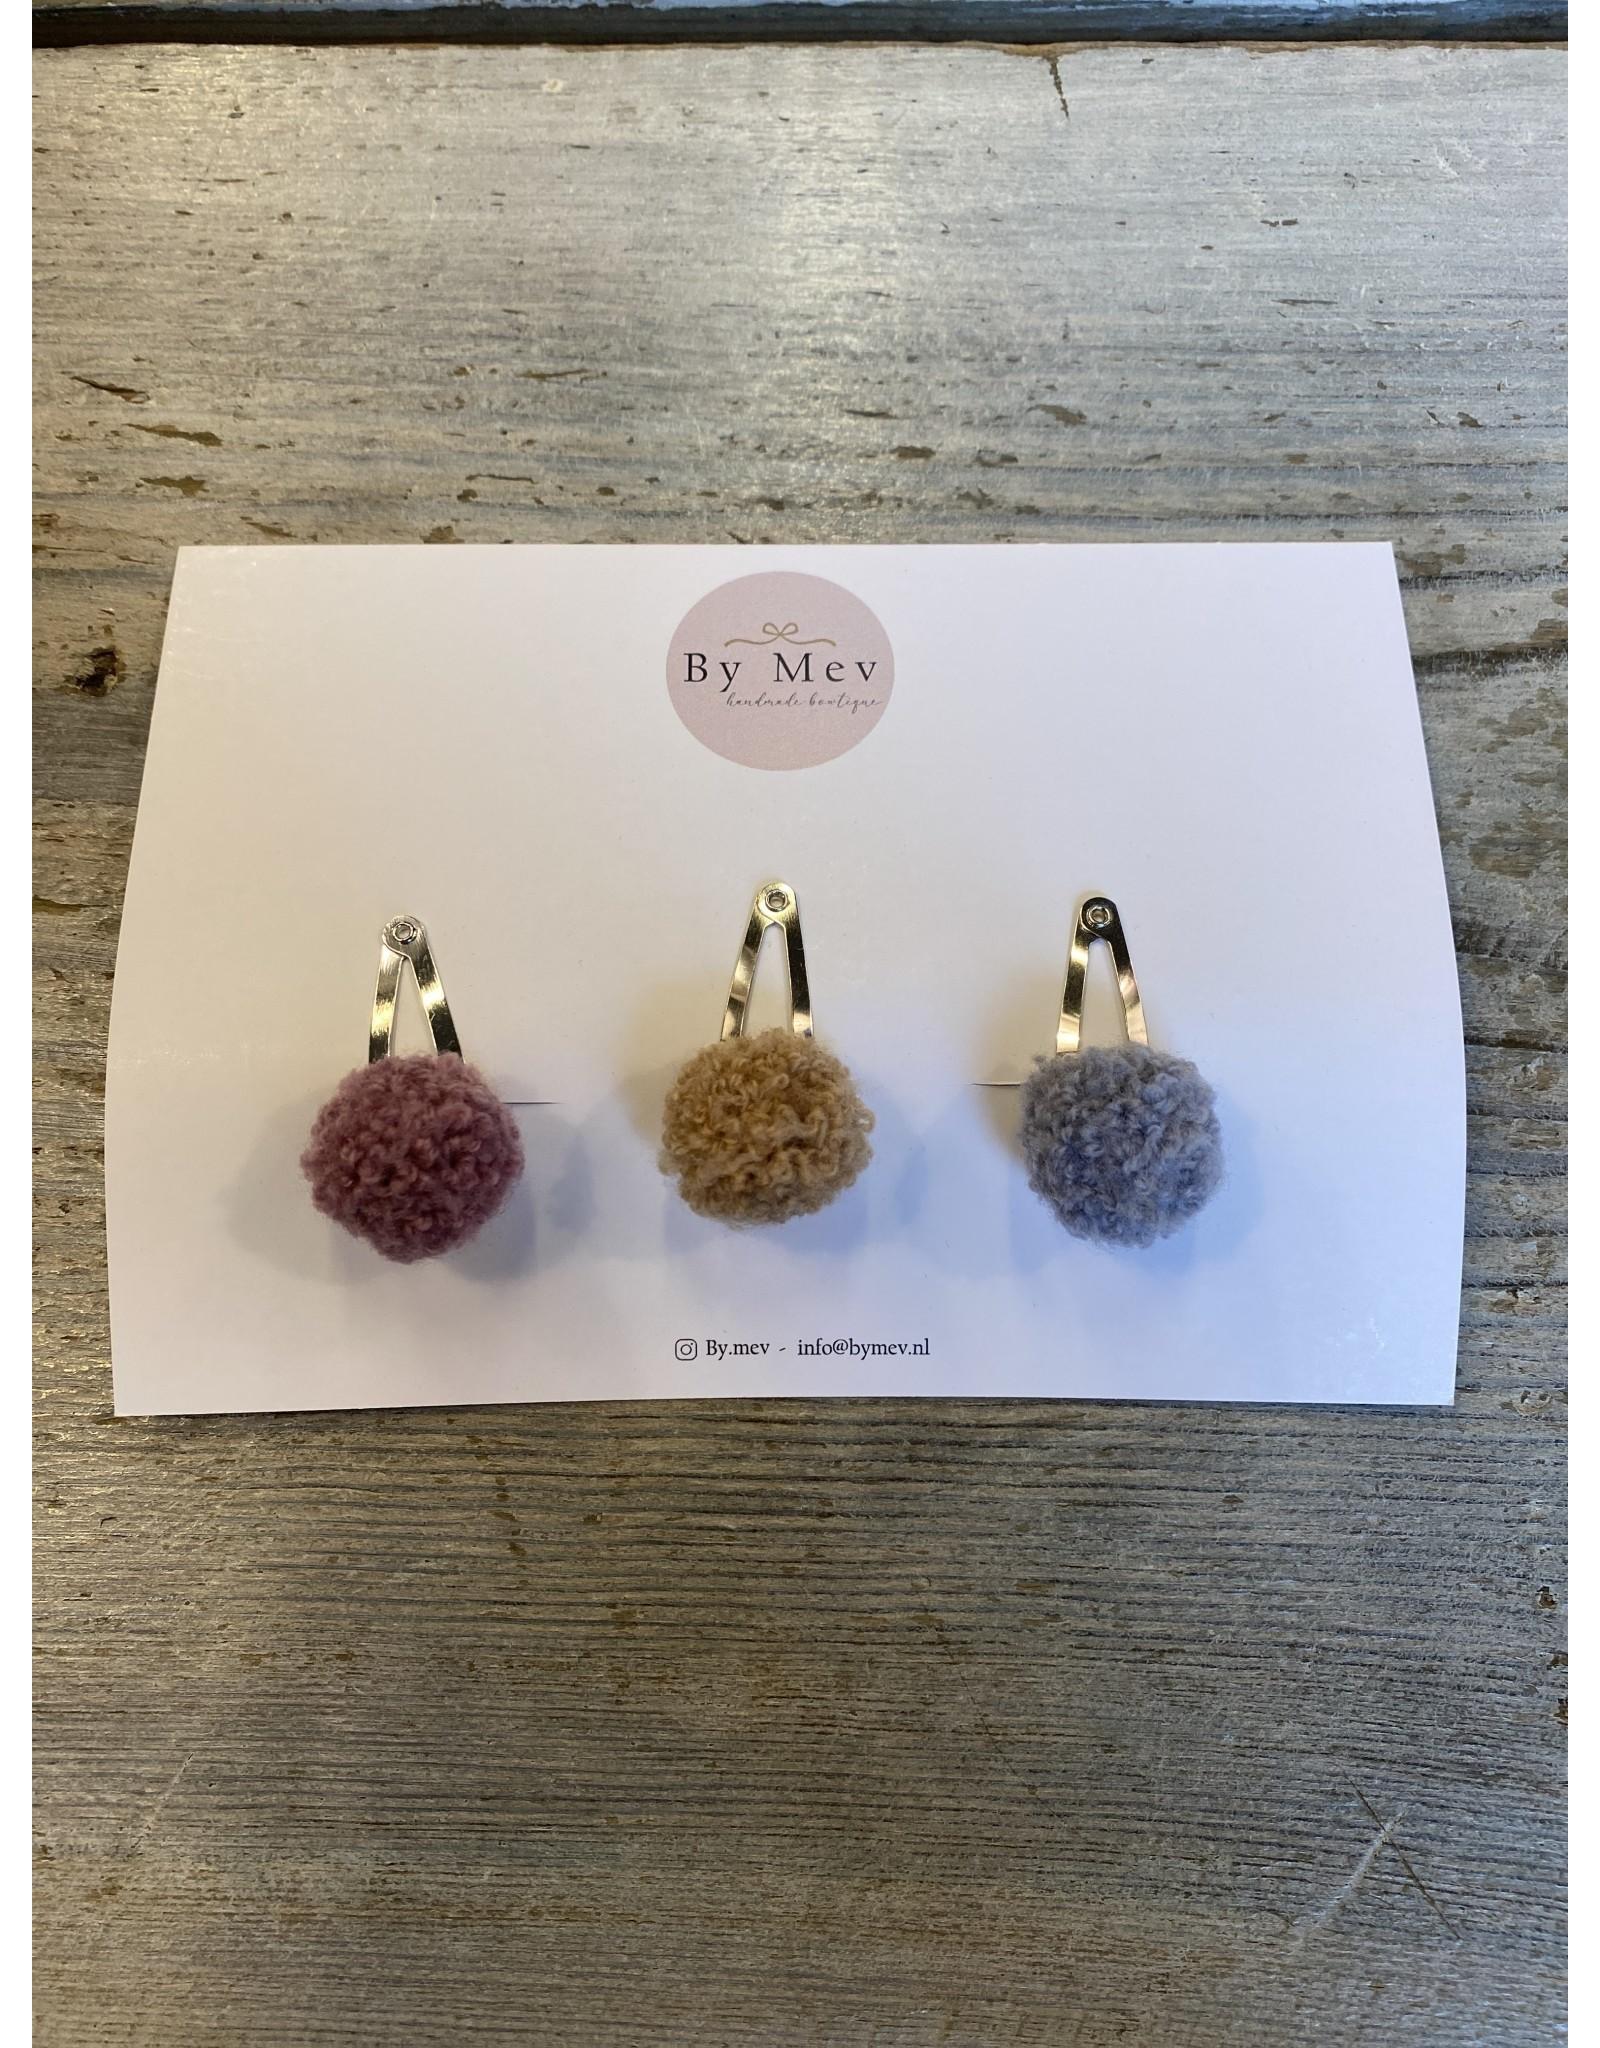 Bymev Mini wool pompom 3 cm - 3pcs purple